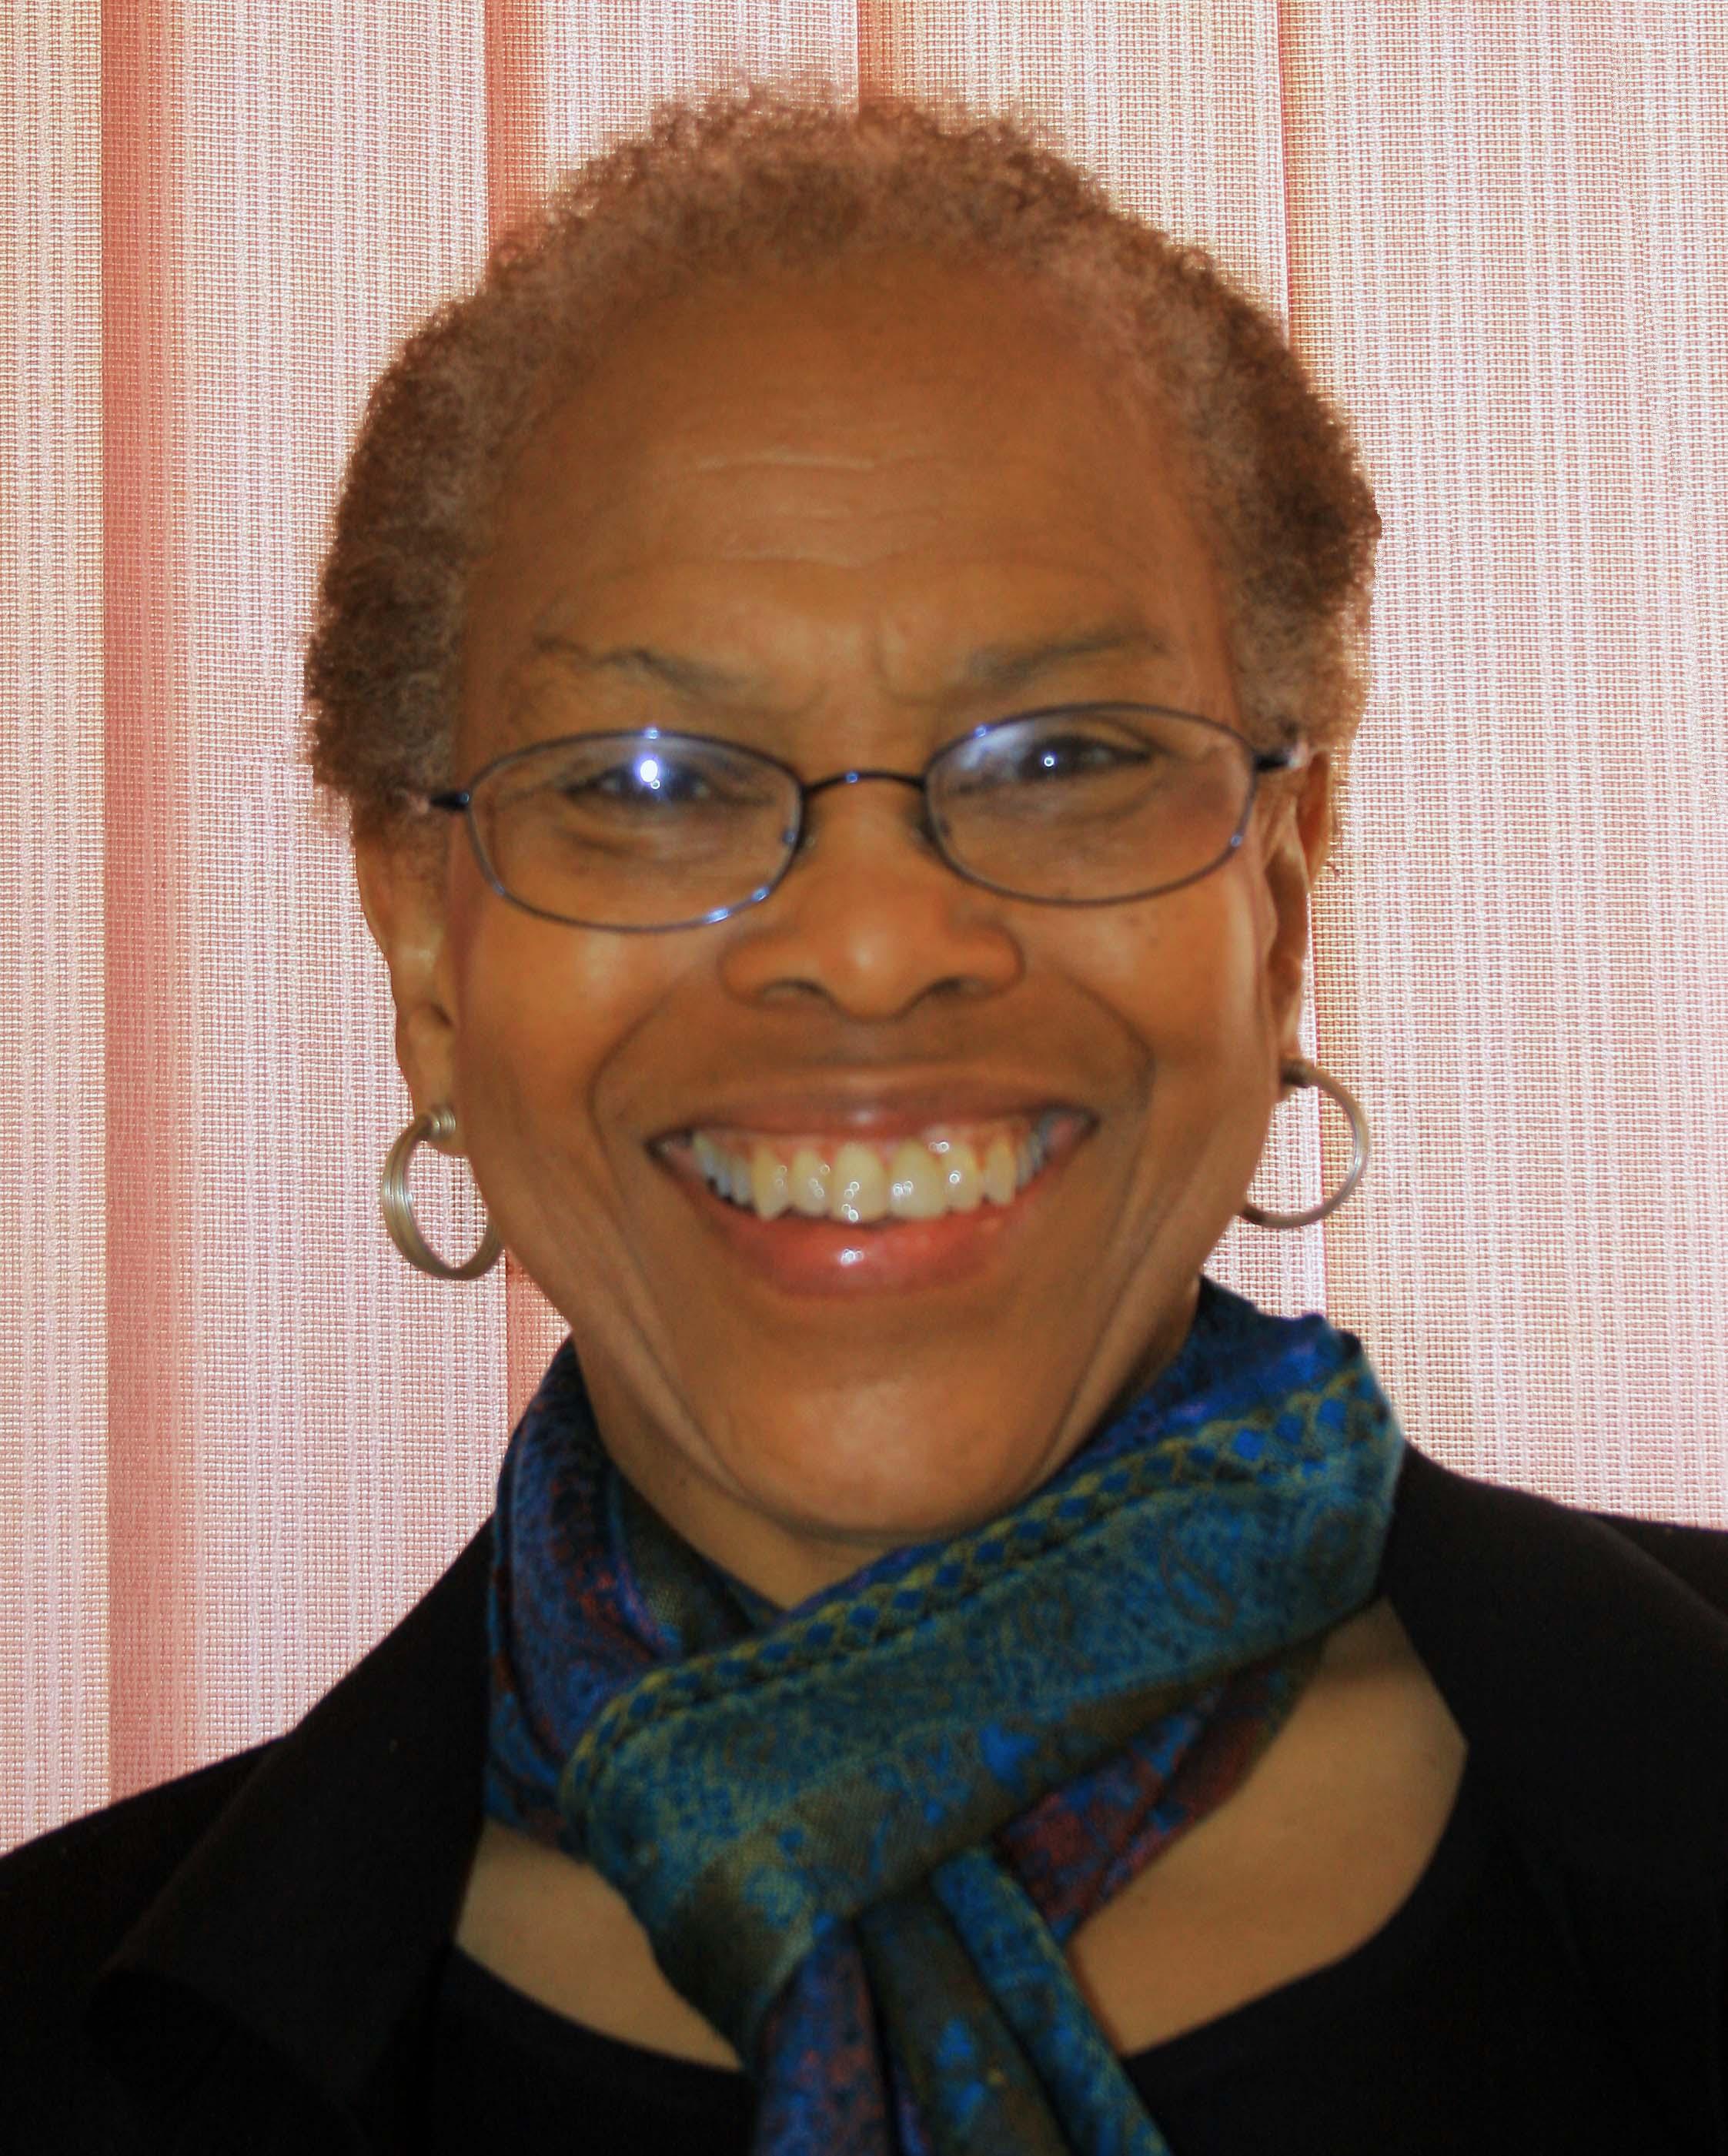 Pamela J. Coveney